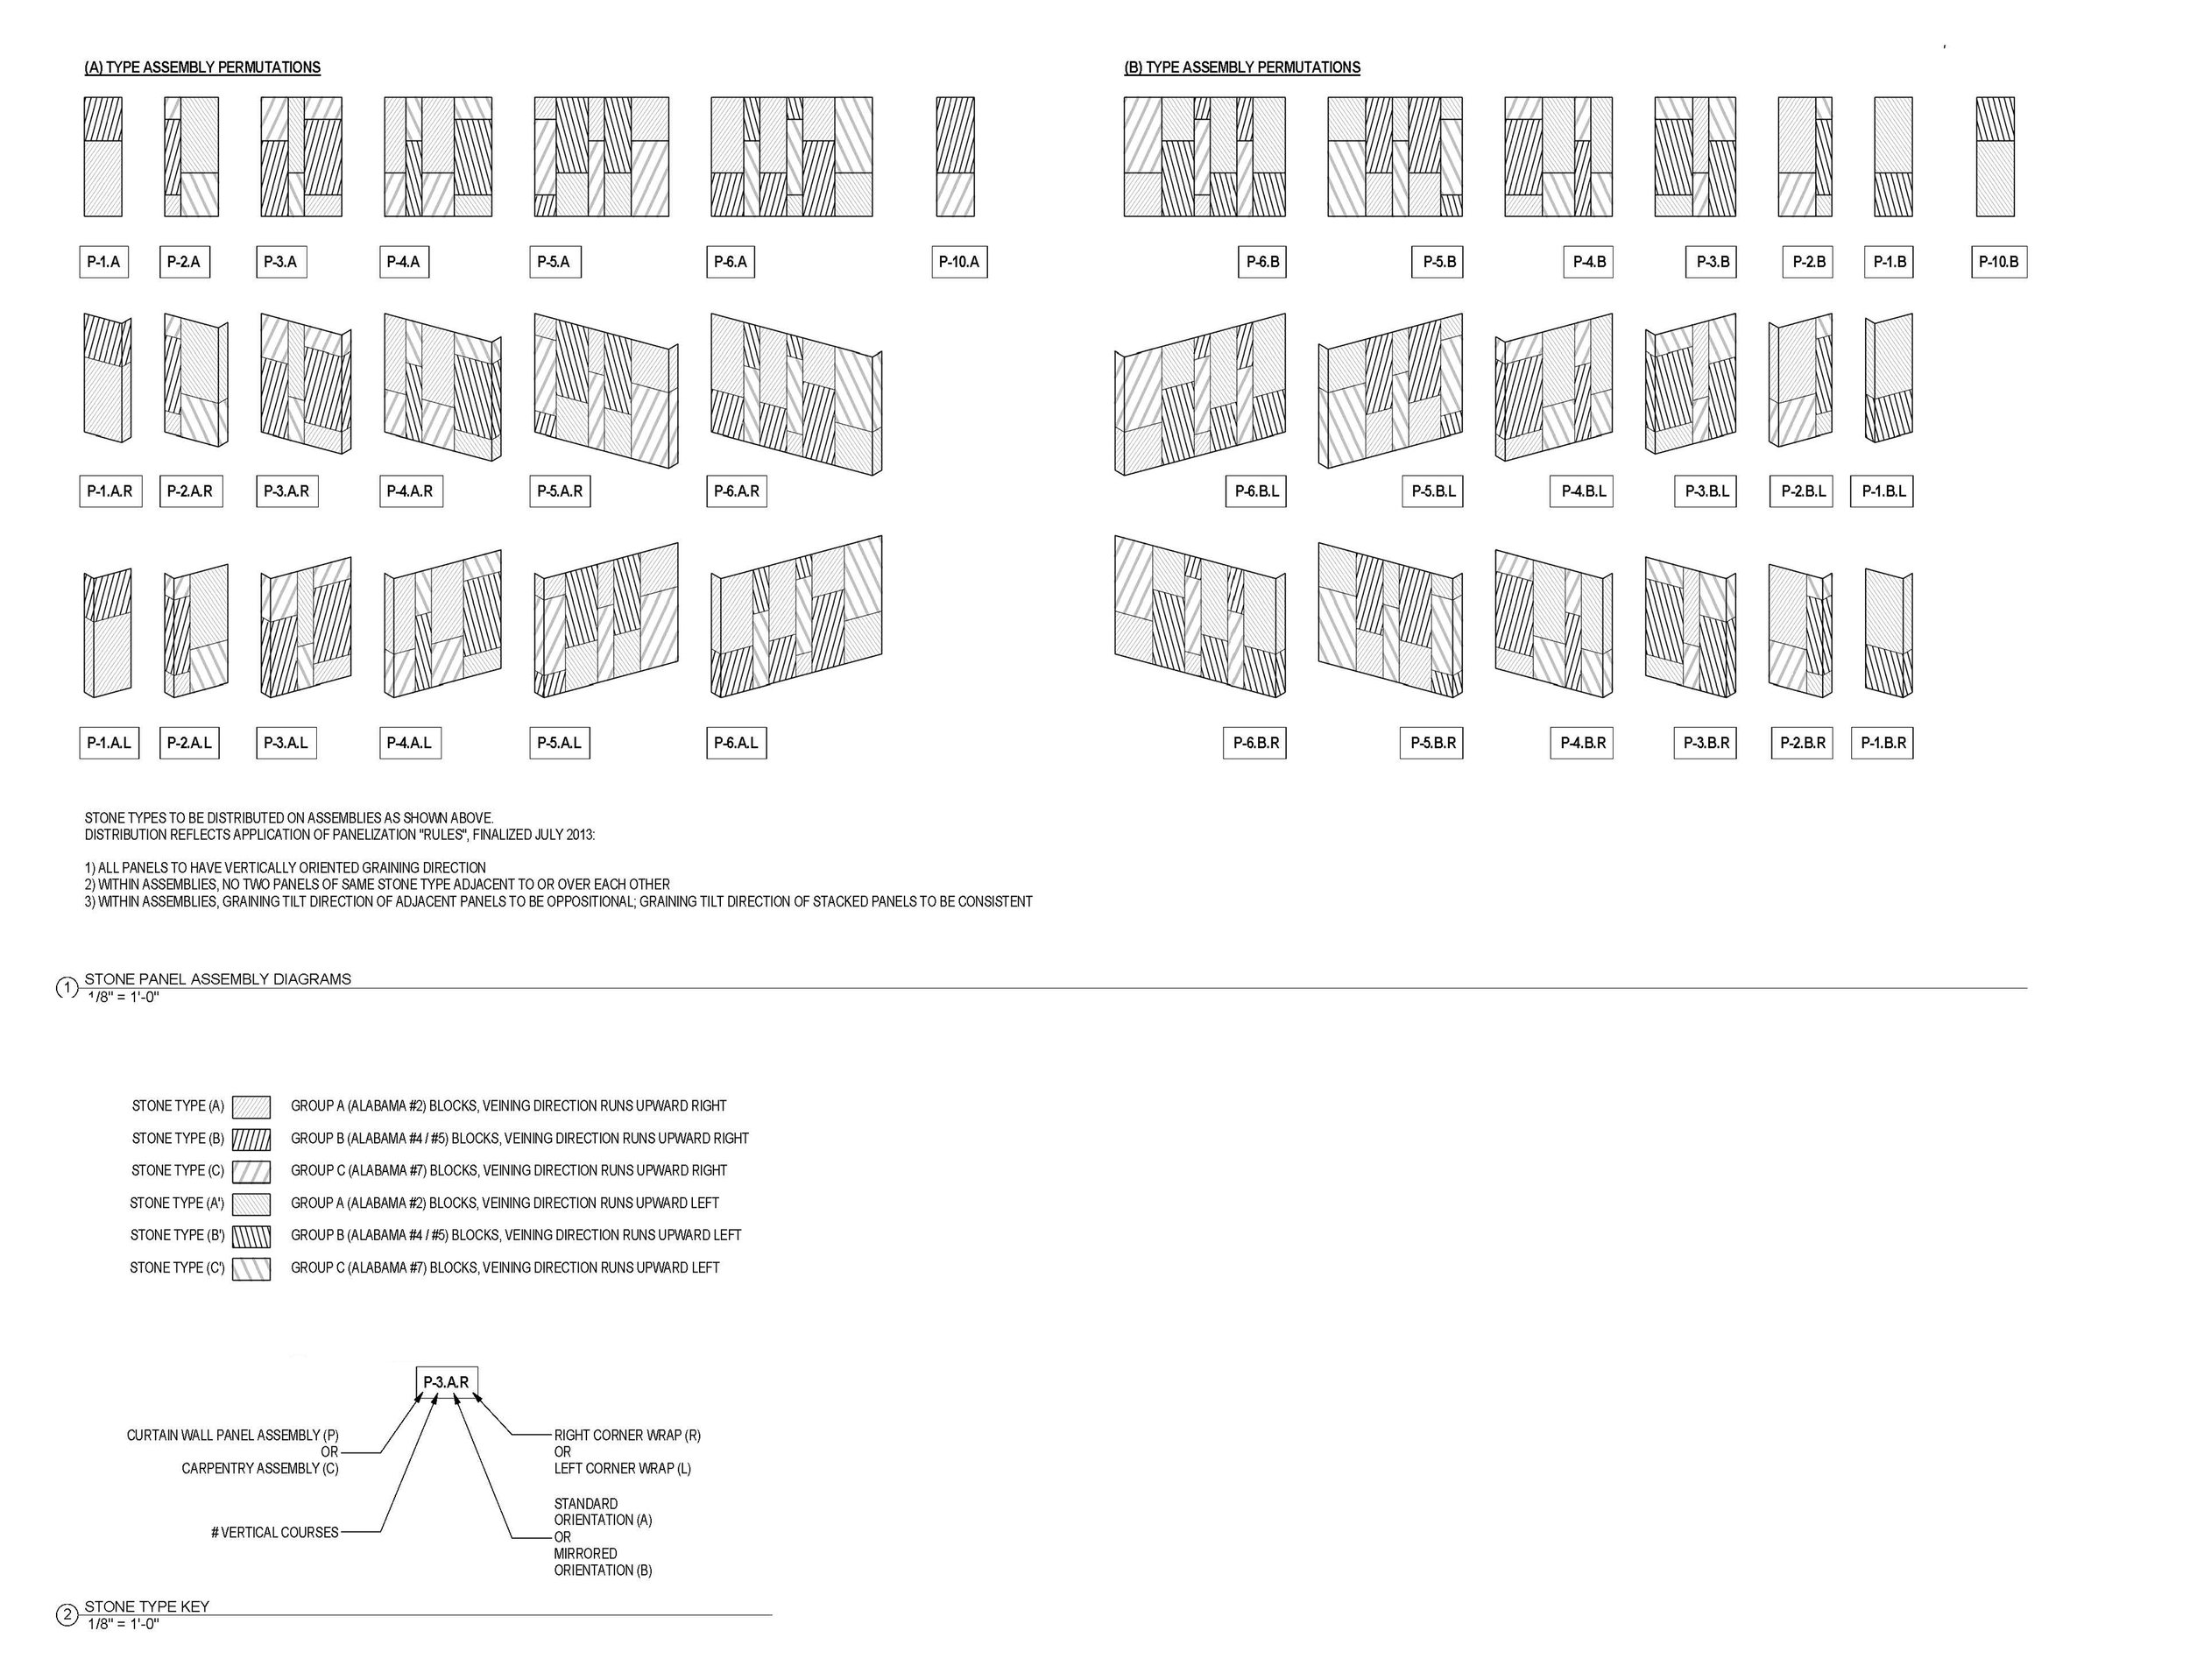 panelization01.jpg